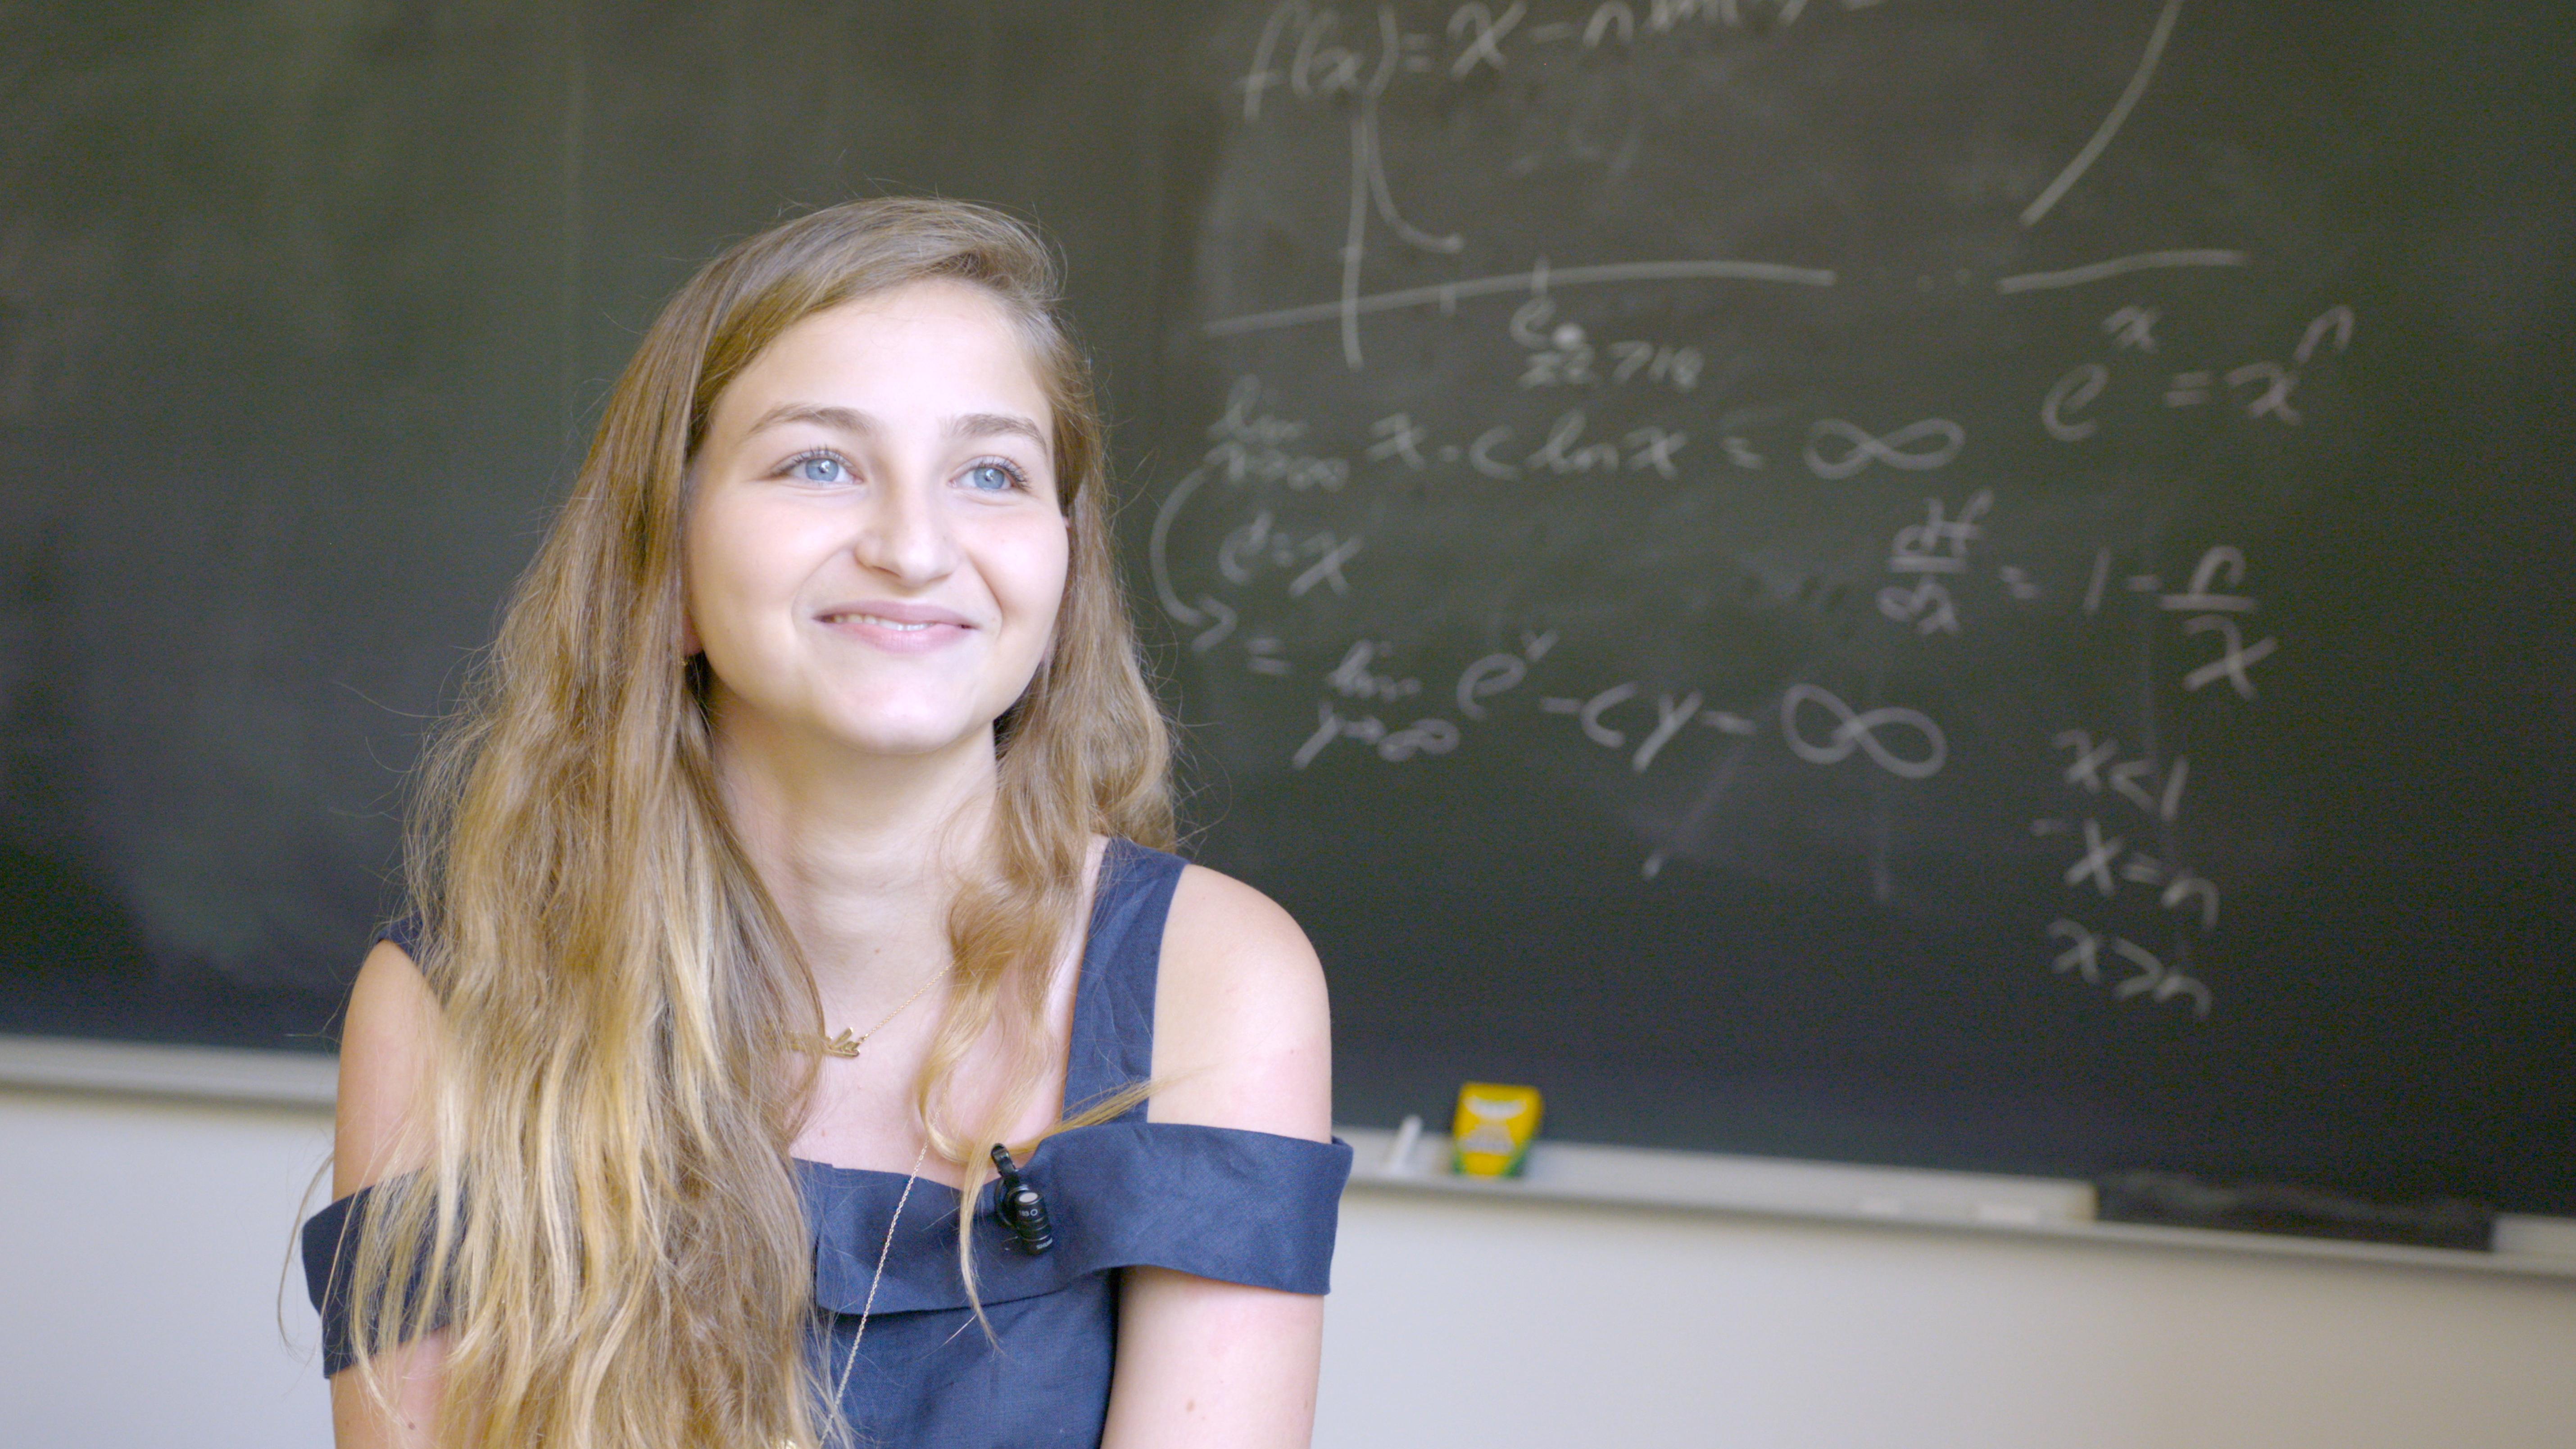 Summer Program - Science | Harvard University: Seven-week Program for High School Students